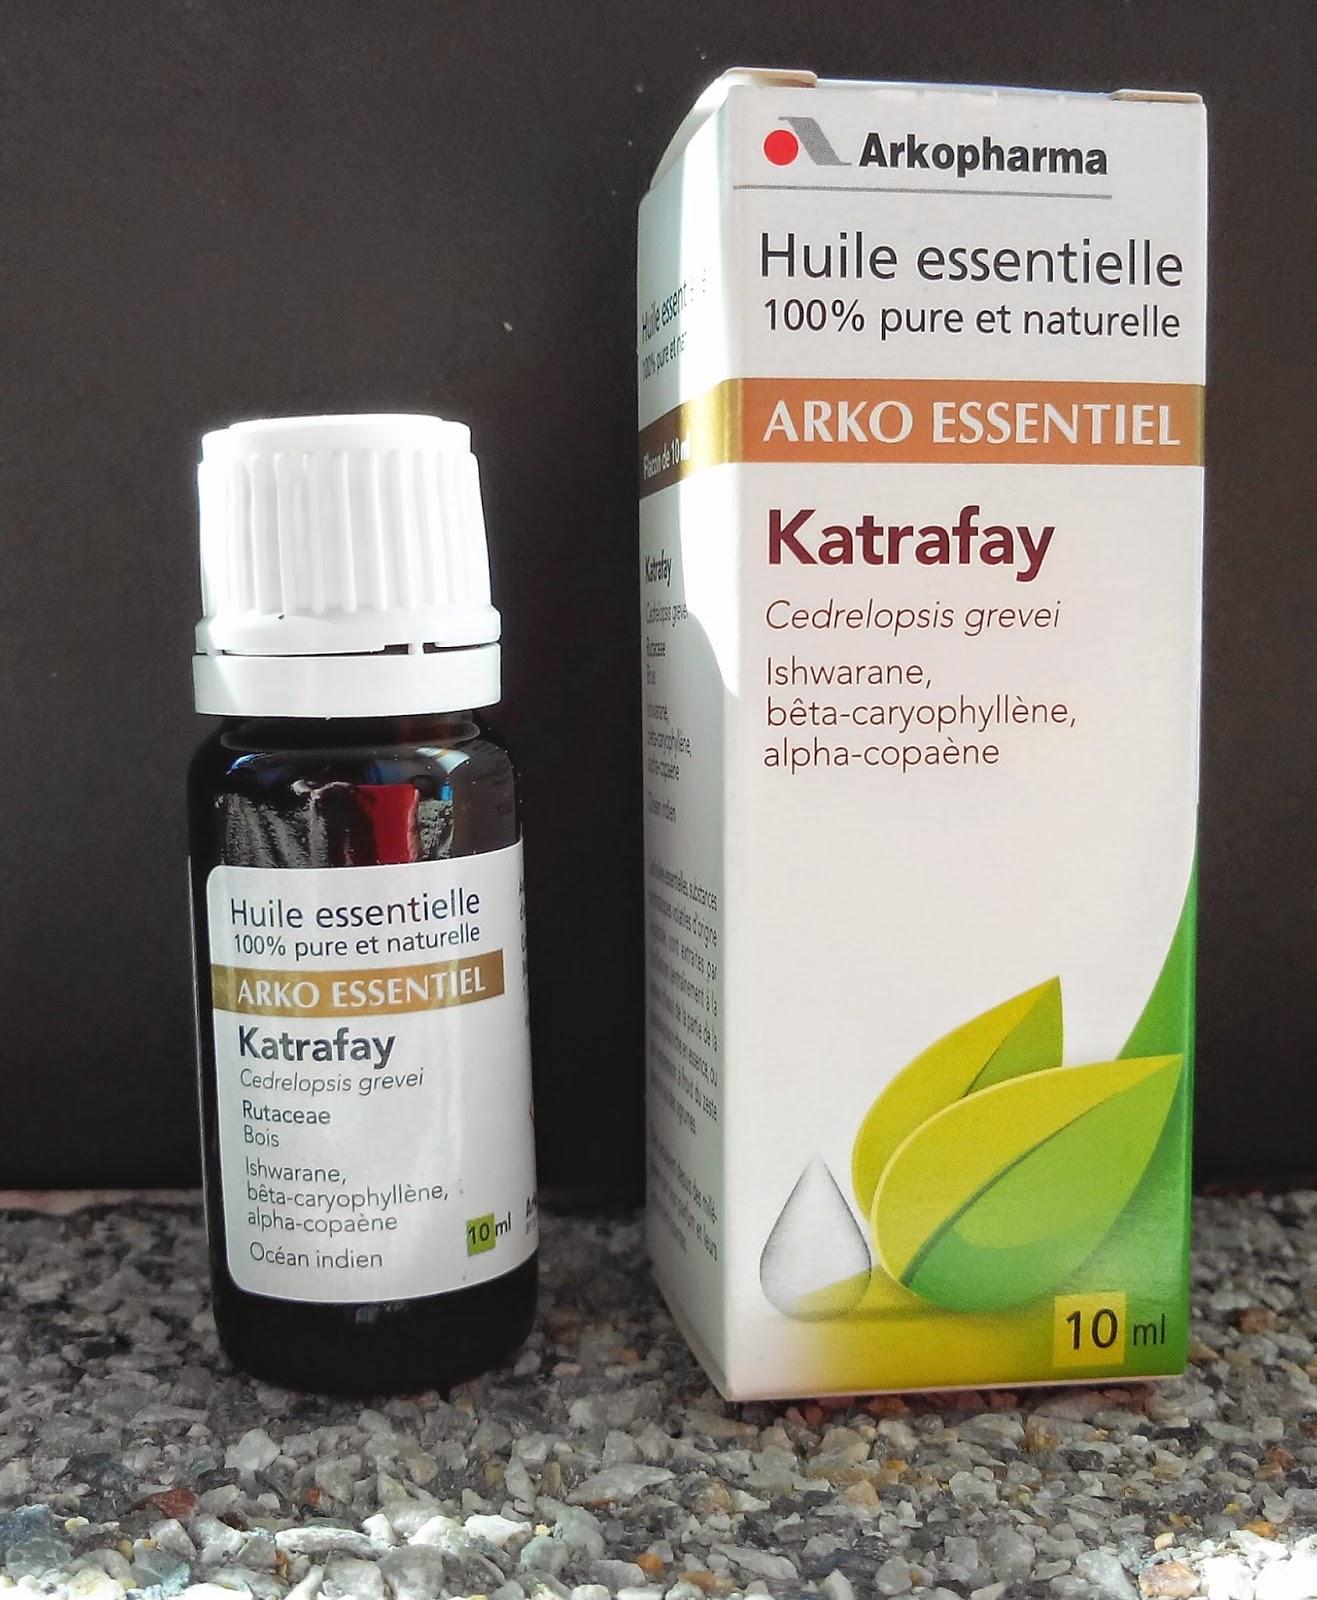 huile essentielle de Katrafay desLaboratoires Arkopharma BullElodie